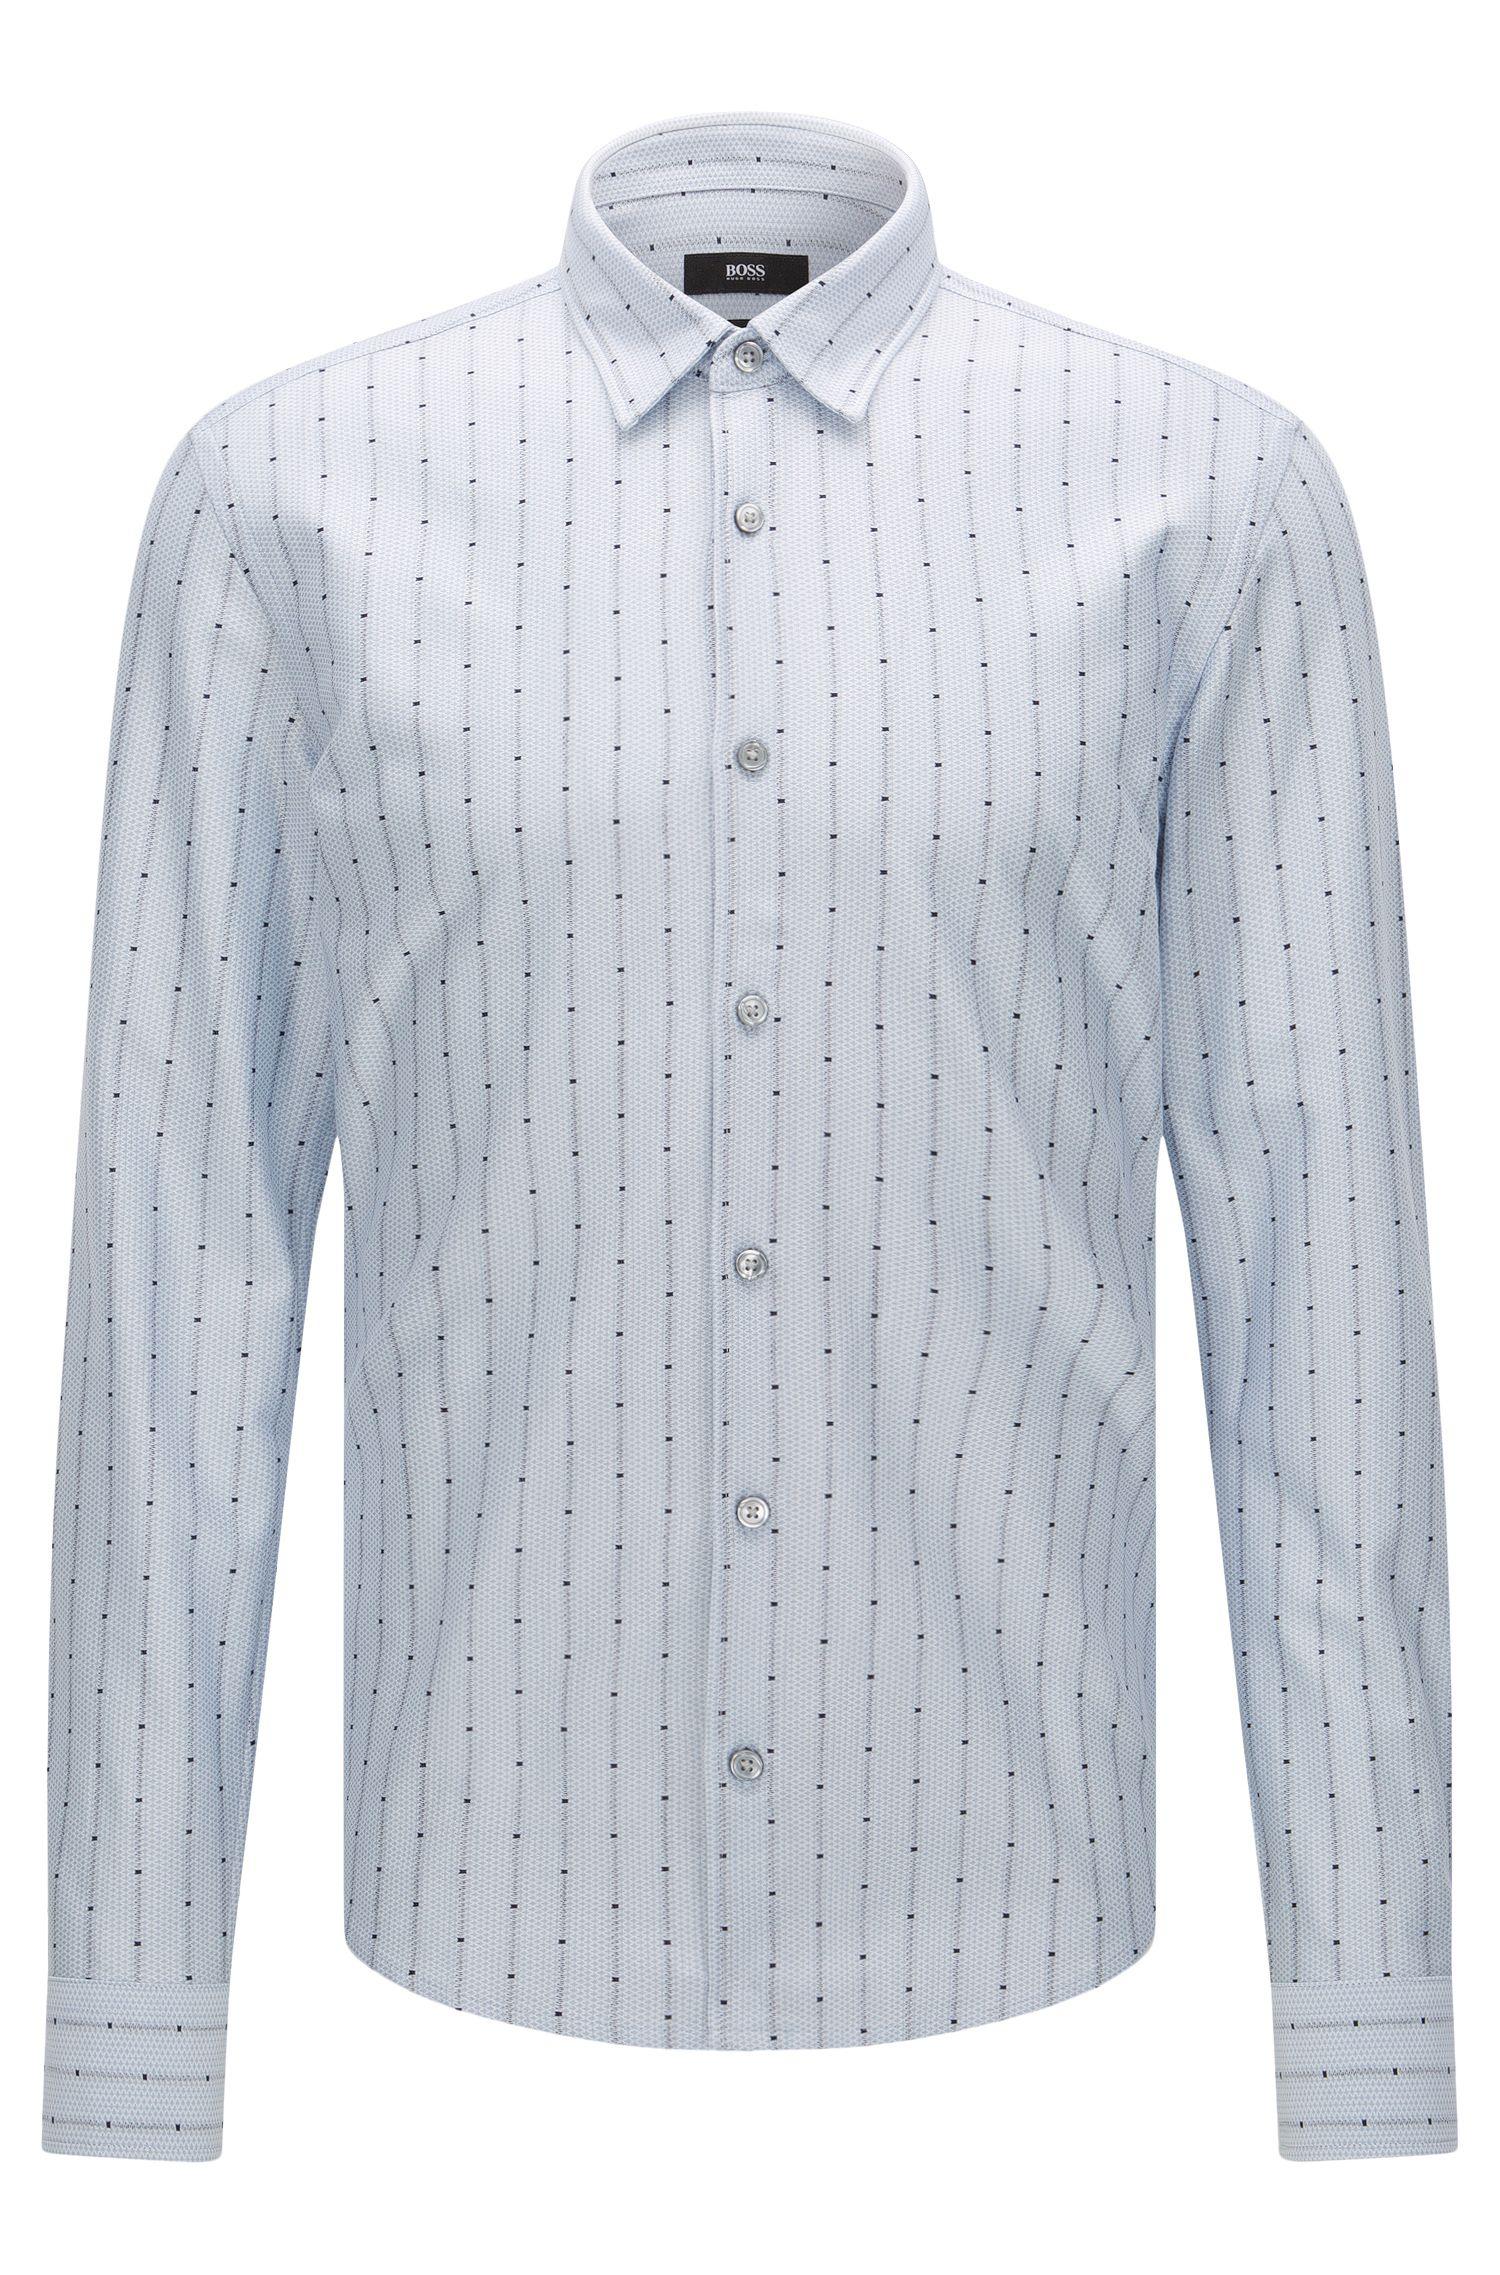 'Reid F' | Slim Fit, Cotton Jersey Button Down Shirt